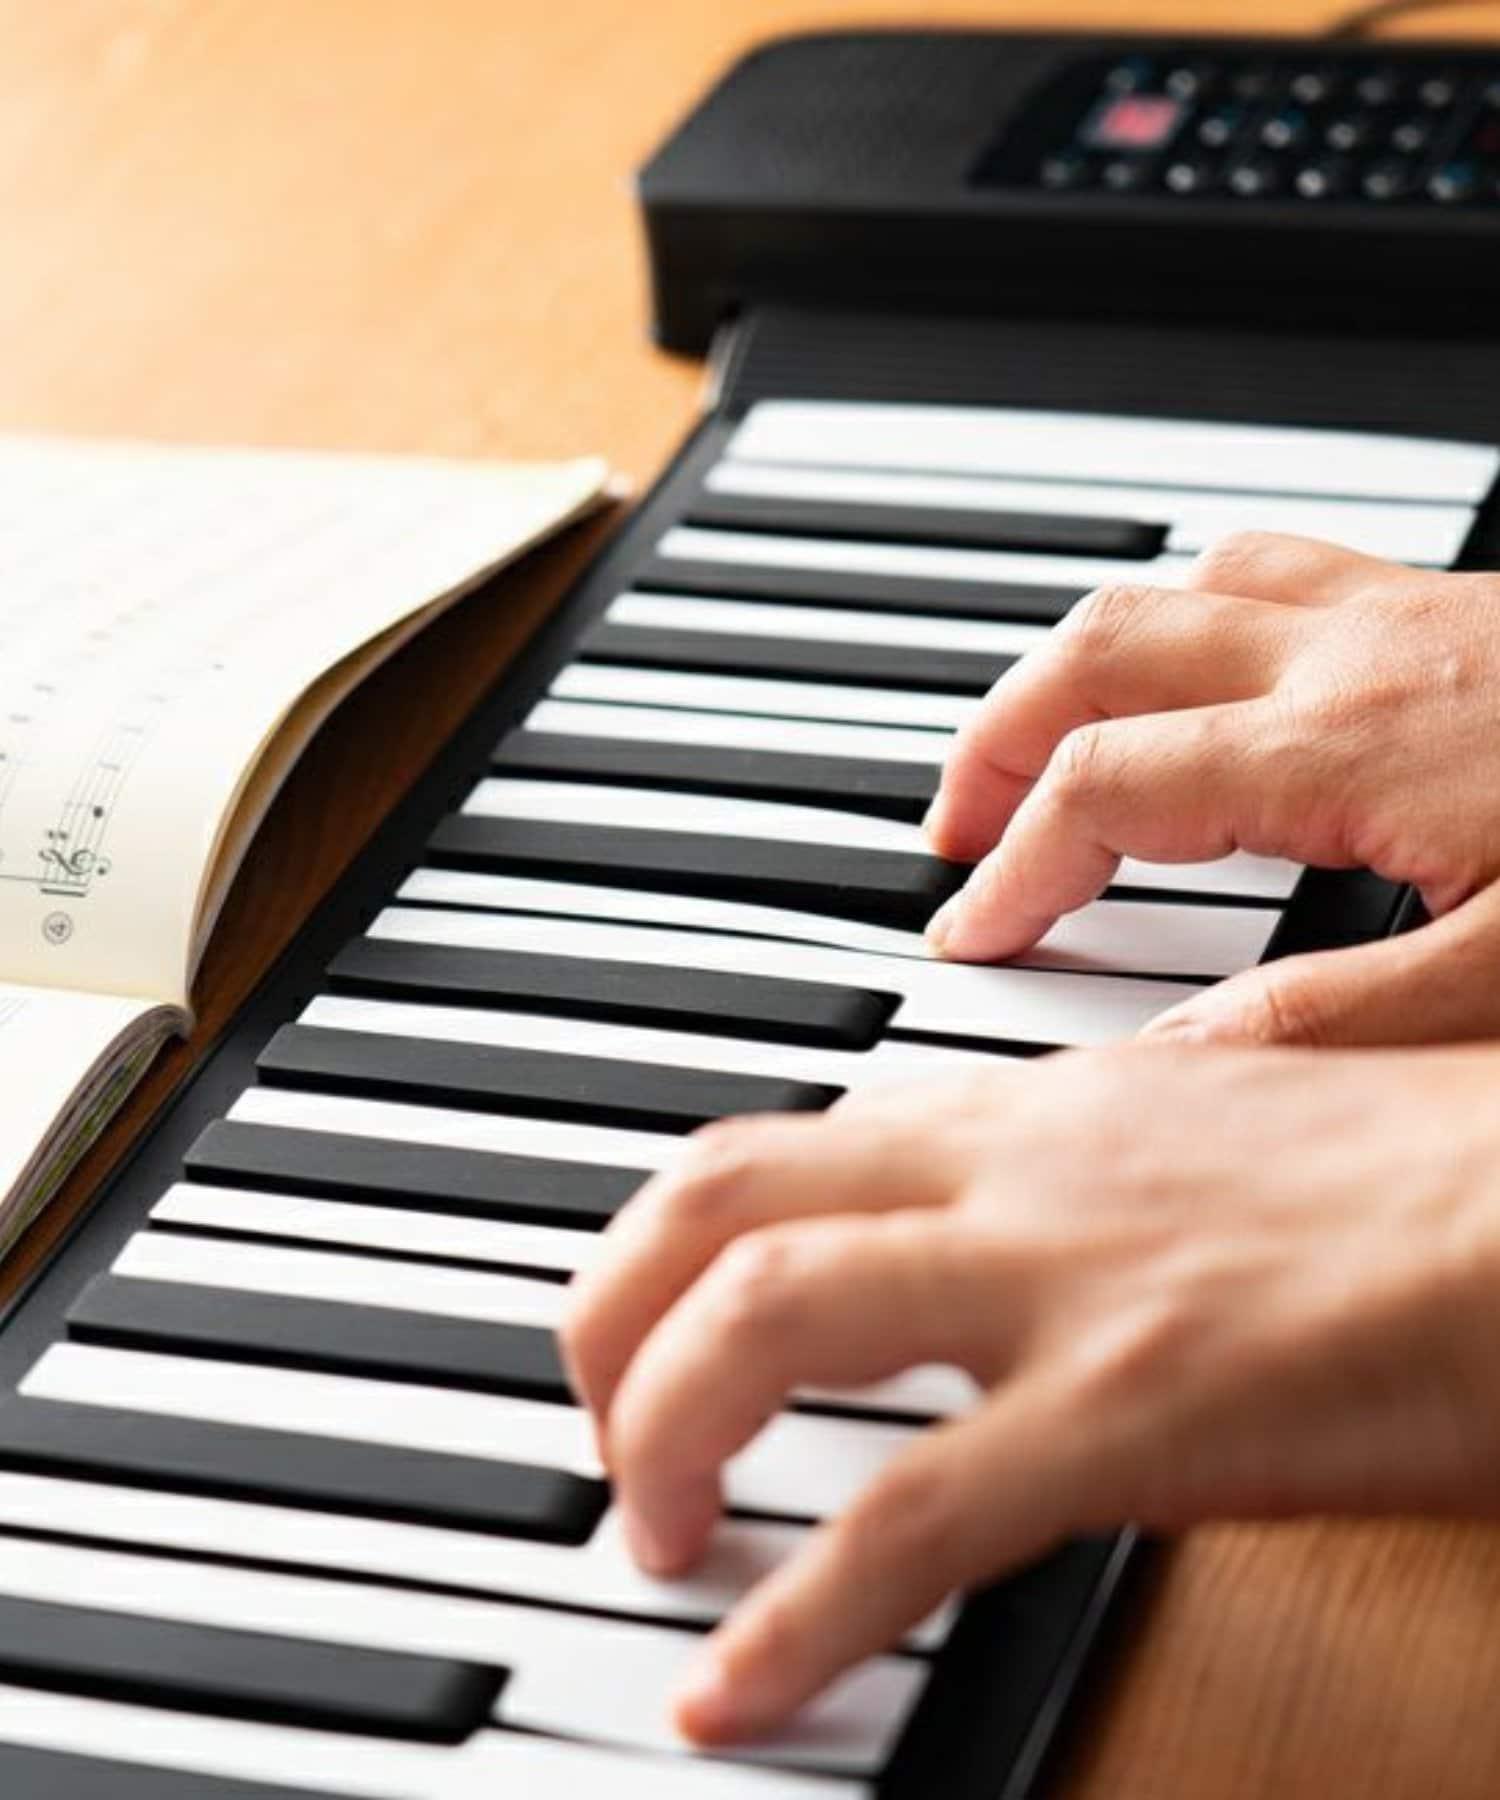 BIRTHDAY BAR(バースデイバー) キッズ 【smaly スマリー】ロールアップ ピアノ61鍵盤 その他